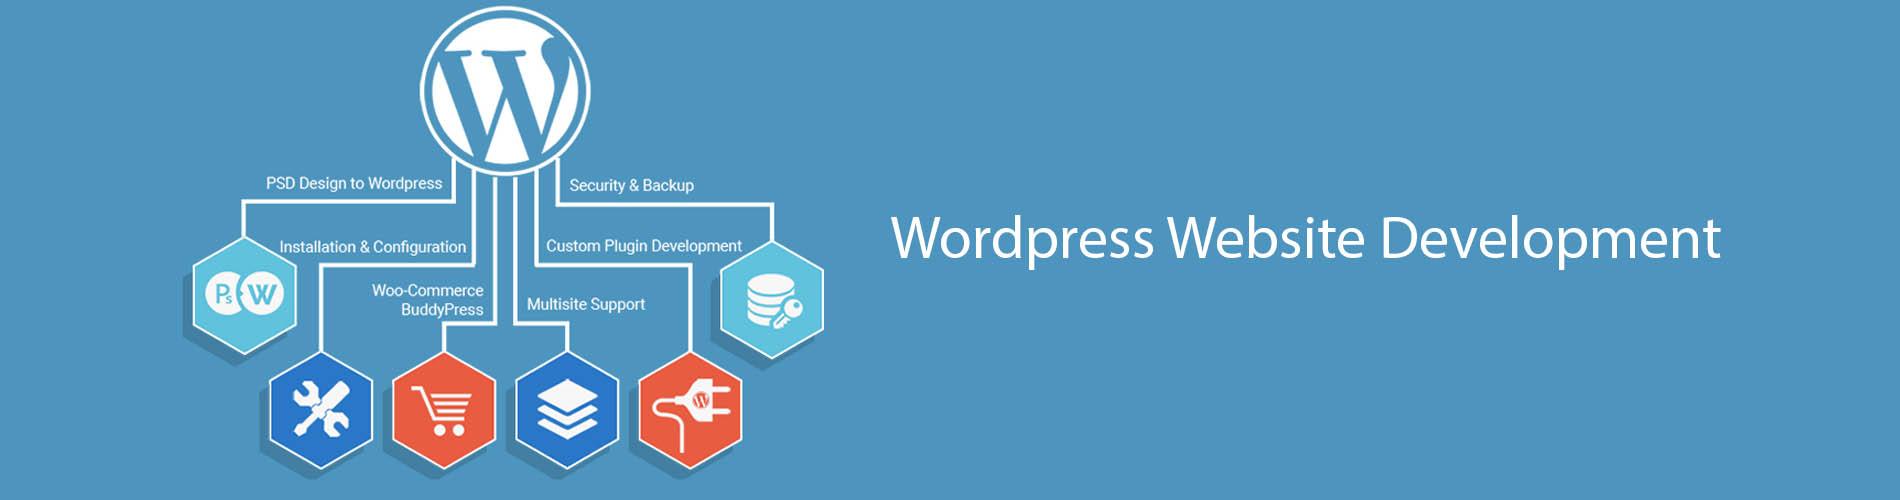 wordpress-website-developement-company